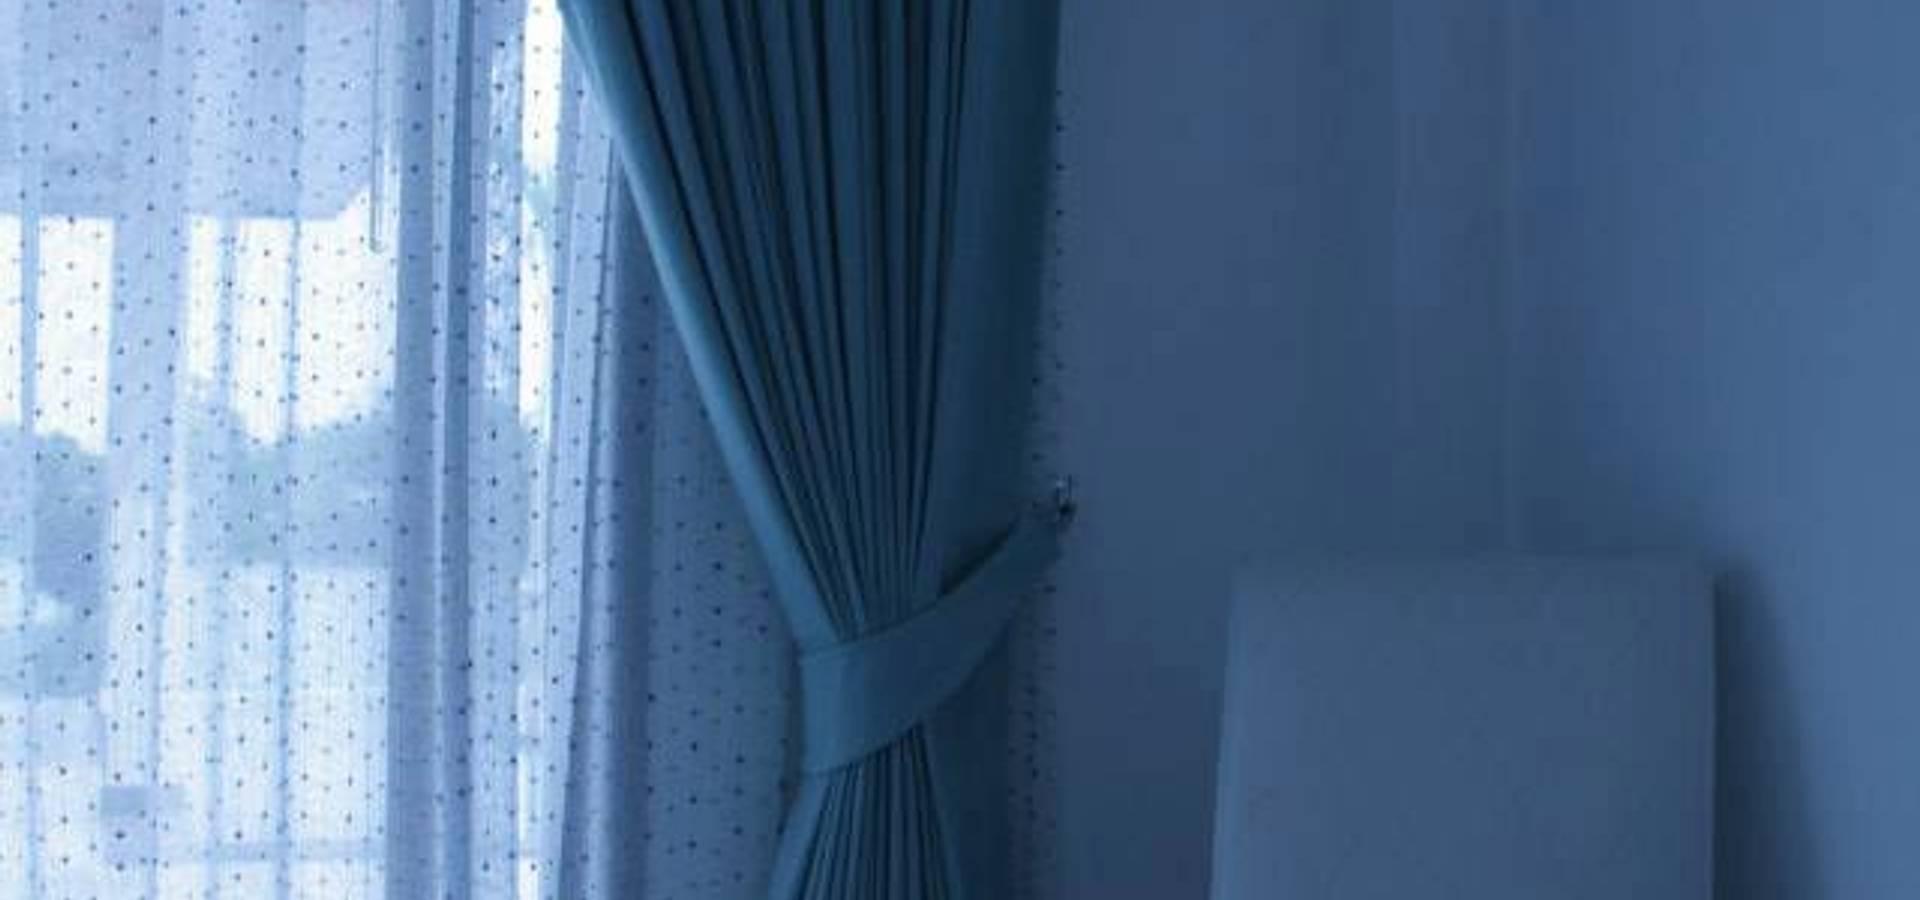 Jibsaa Decor & Design Co.,Ltd <q>Phuket Curtain</q>